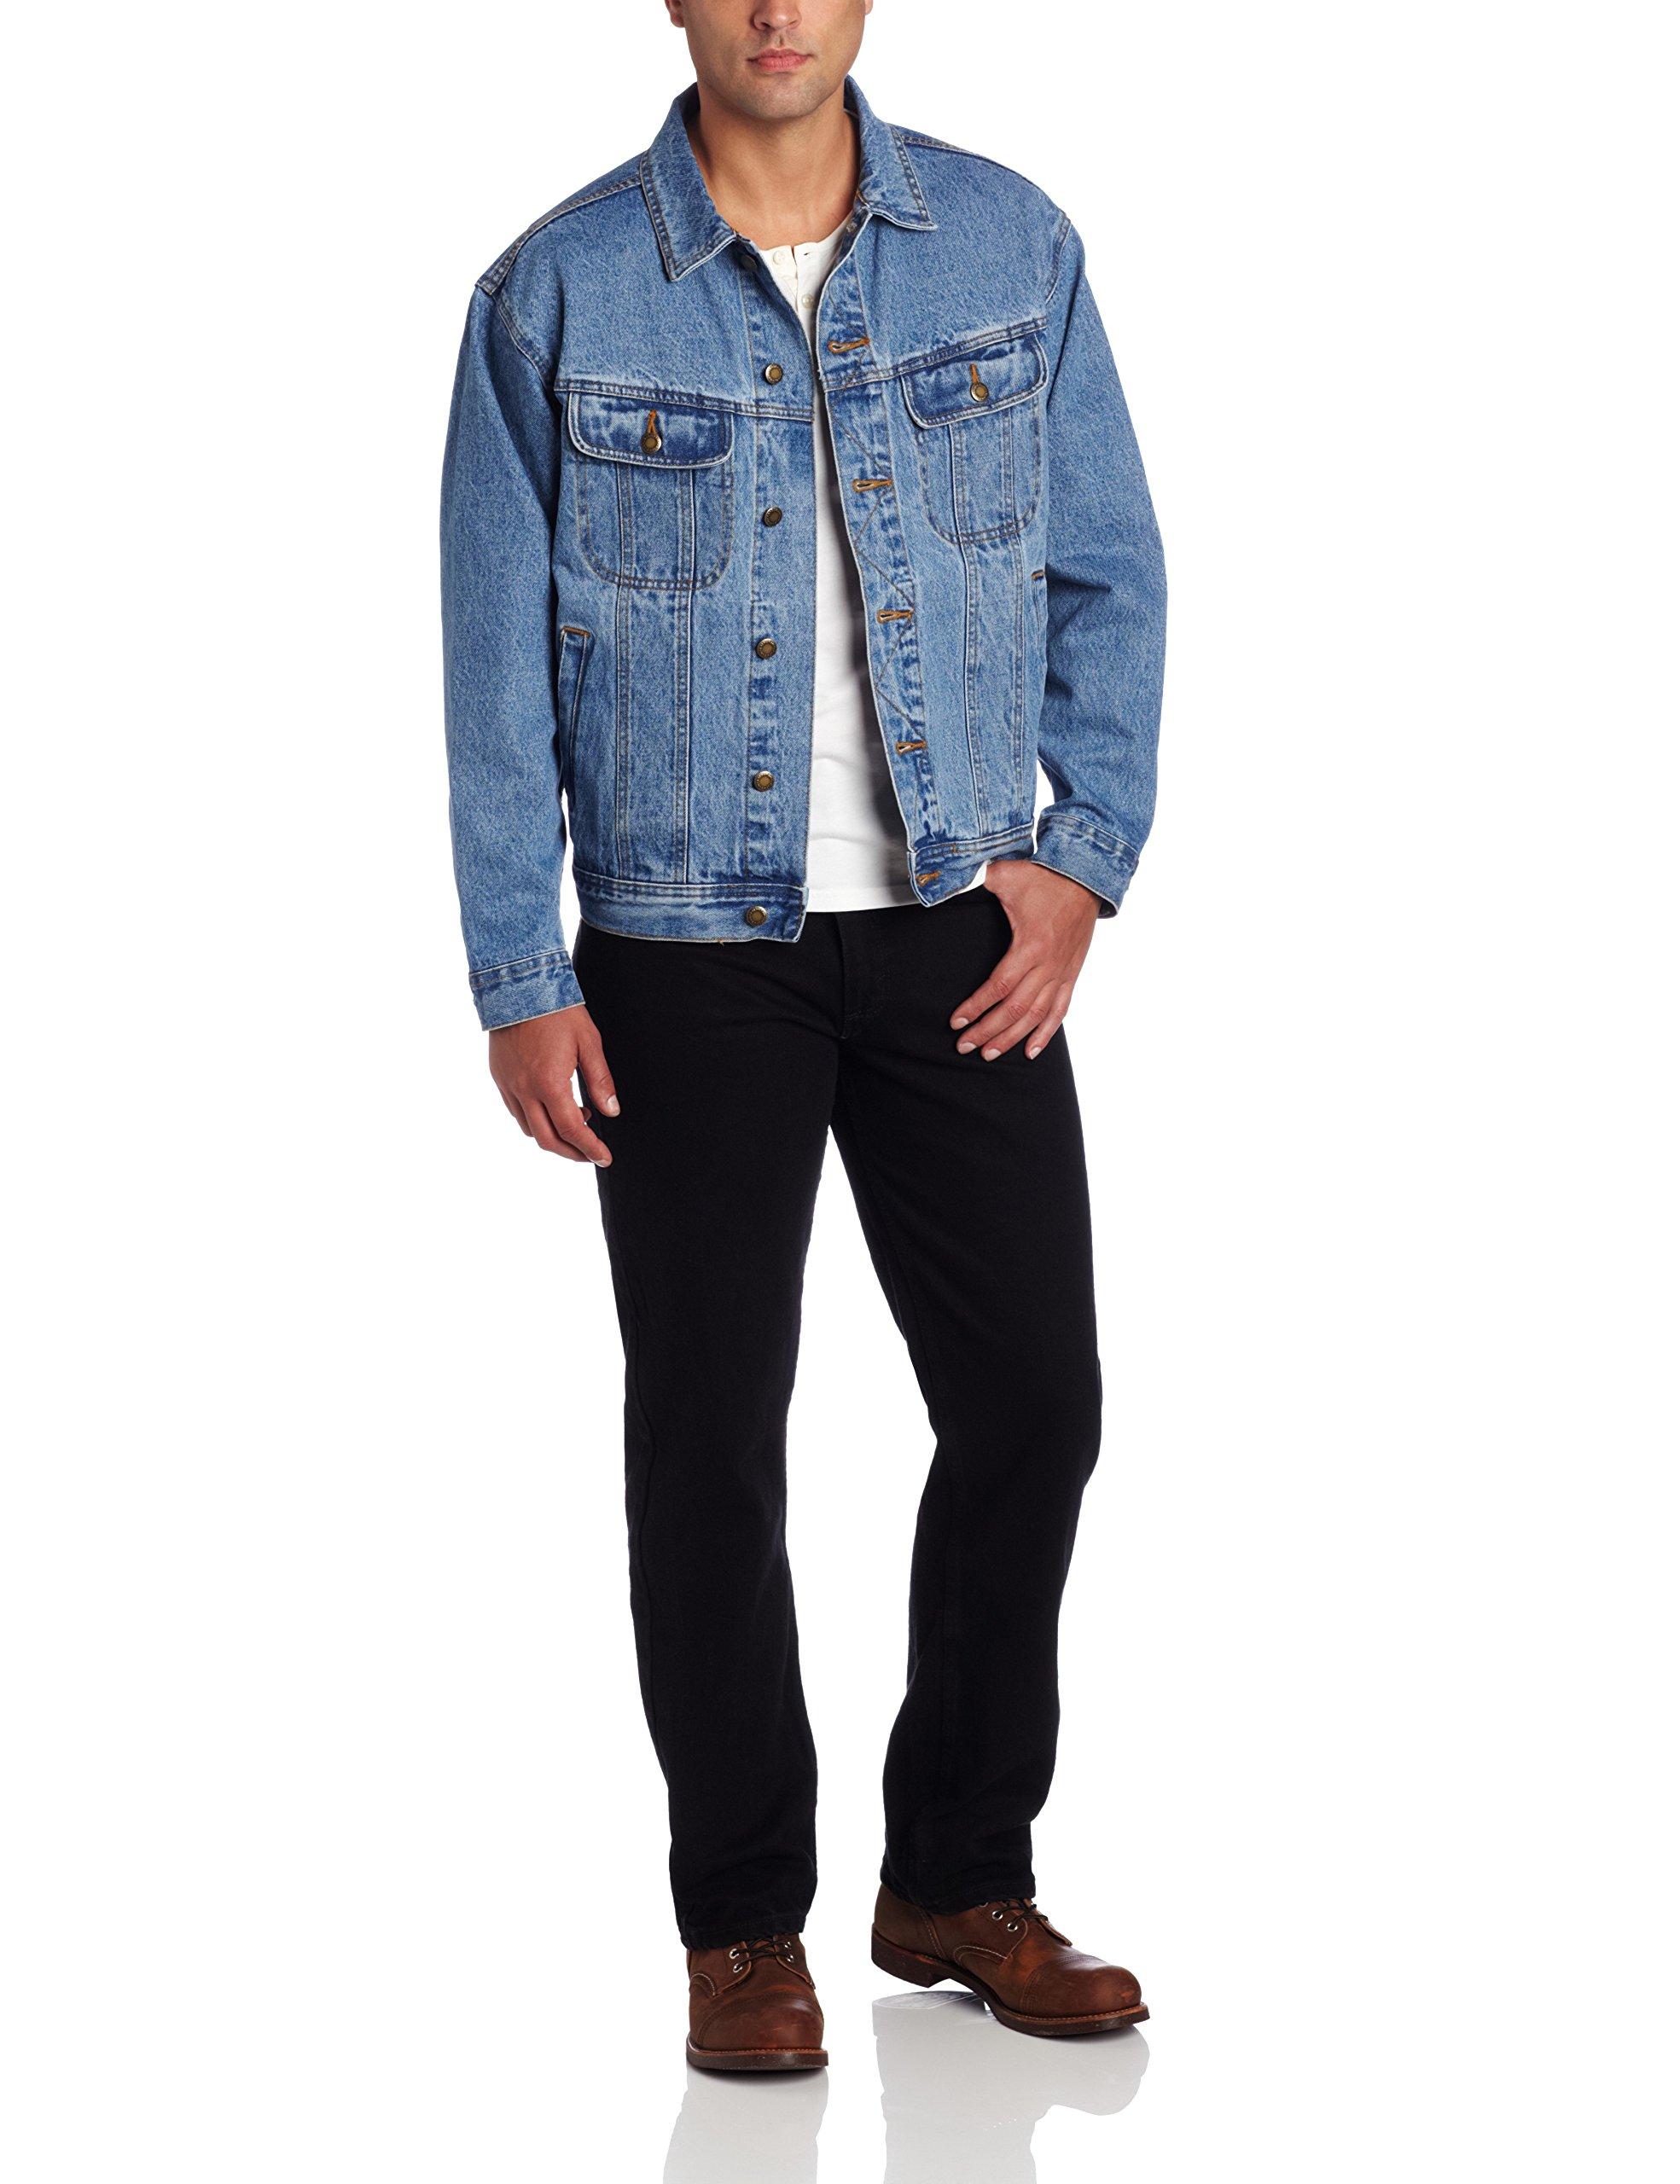 Wrangler Men's Big & Tall Unlined Denim Jacket,Vintage Indigo,X-Large Tall by Wrangler